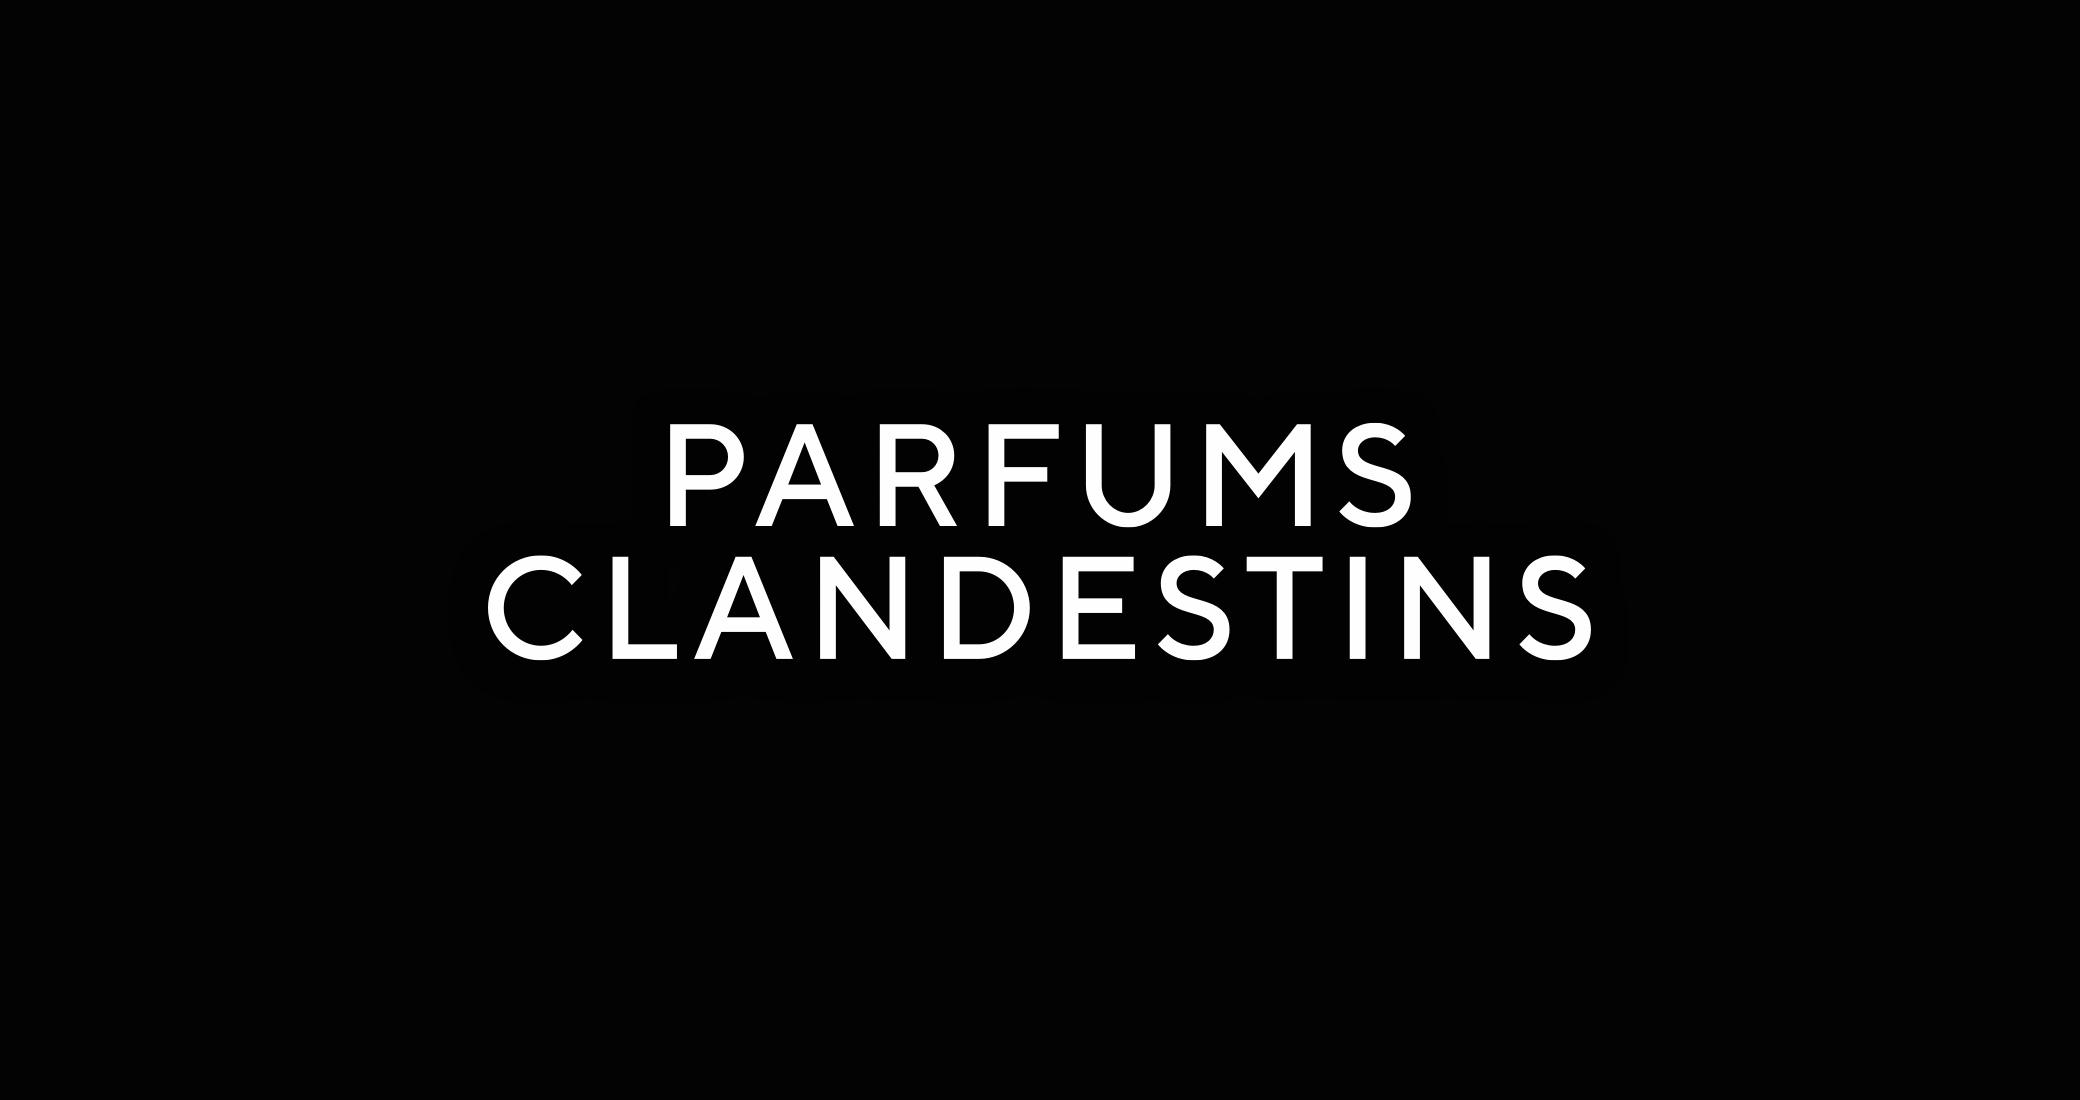 Parfums Clandestins logo